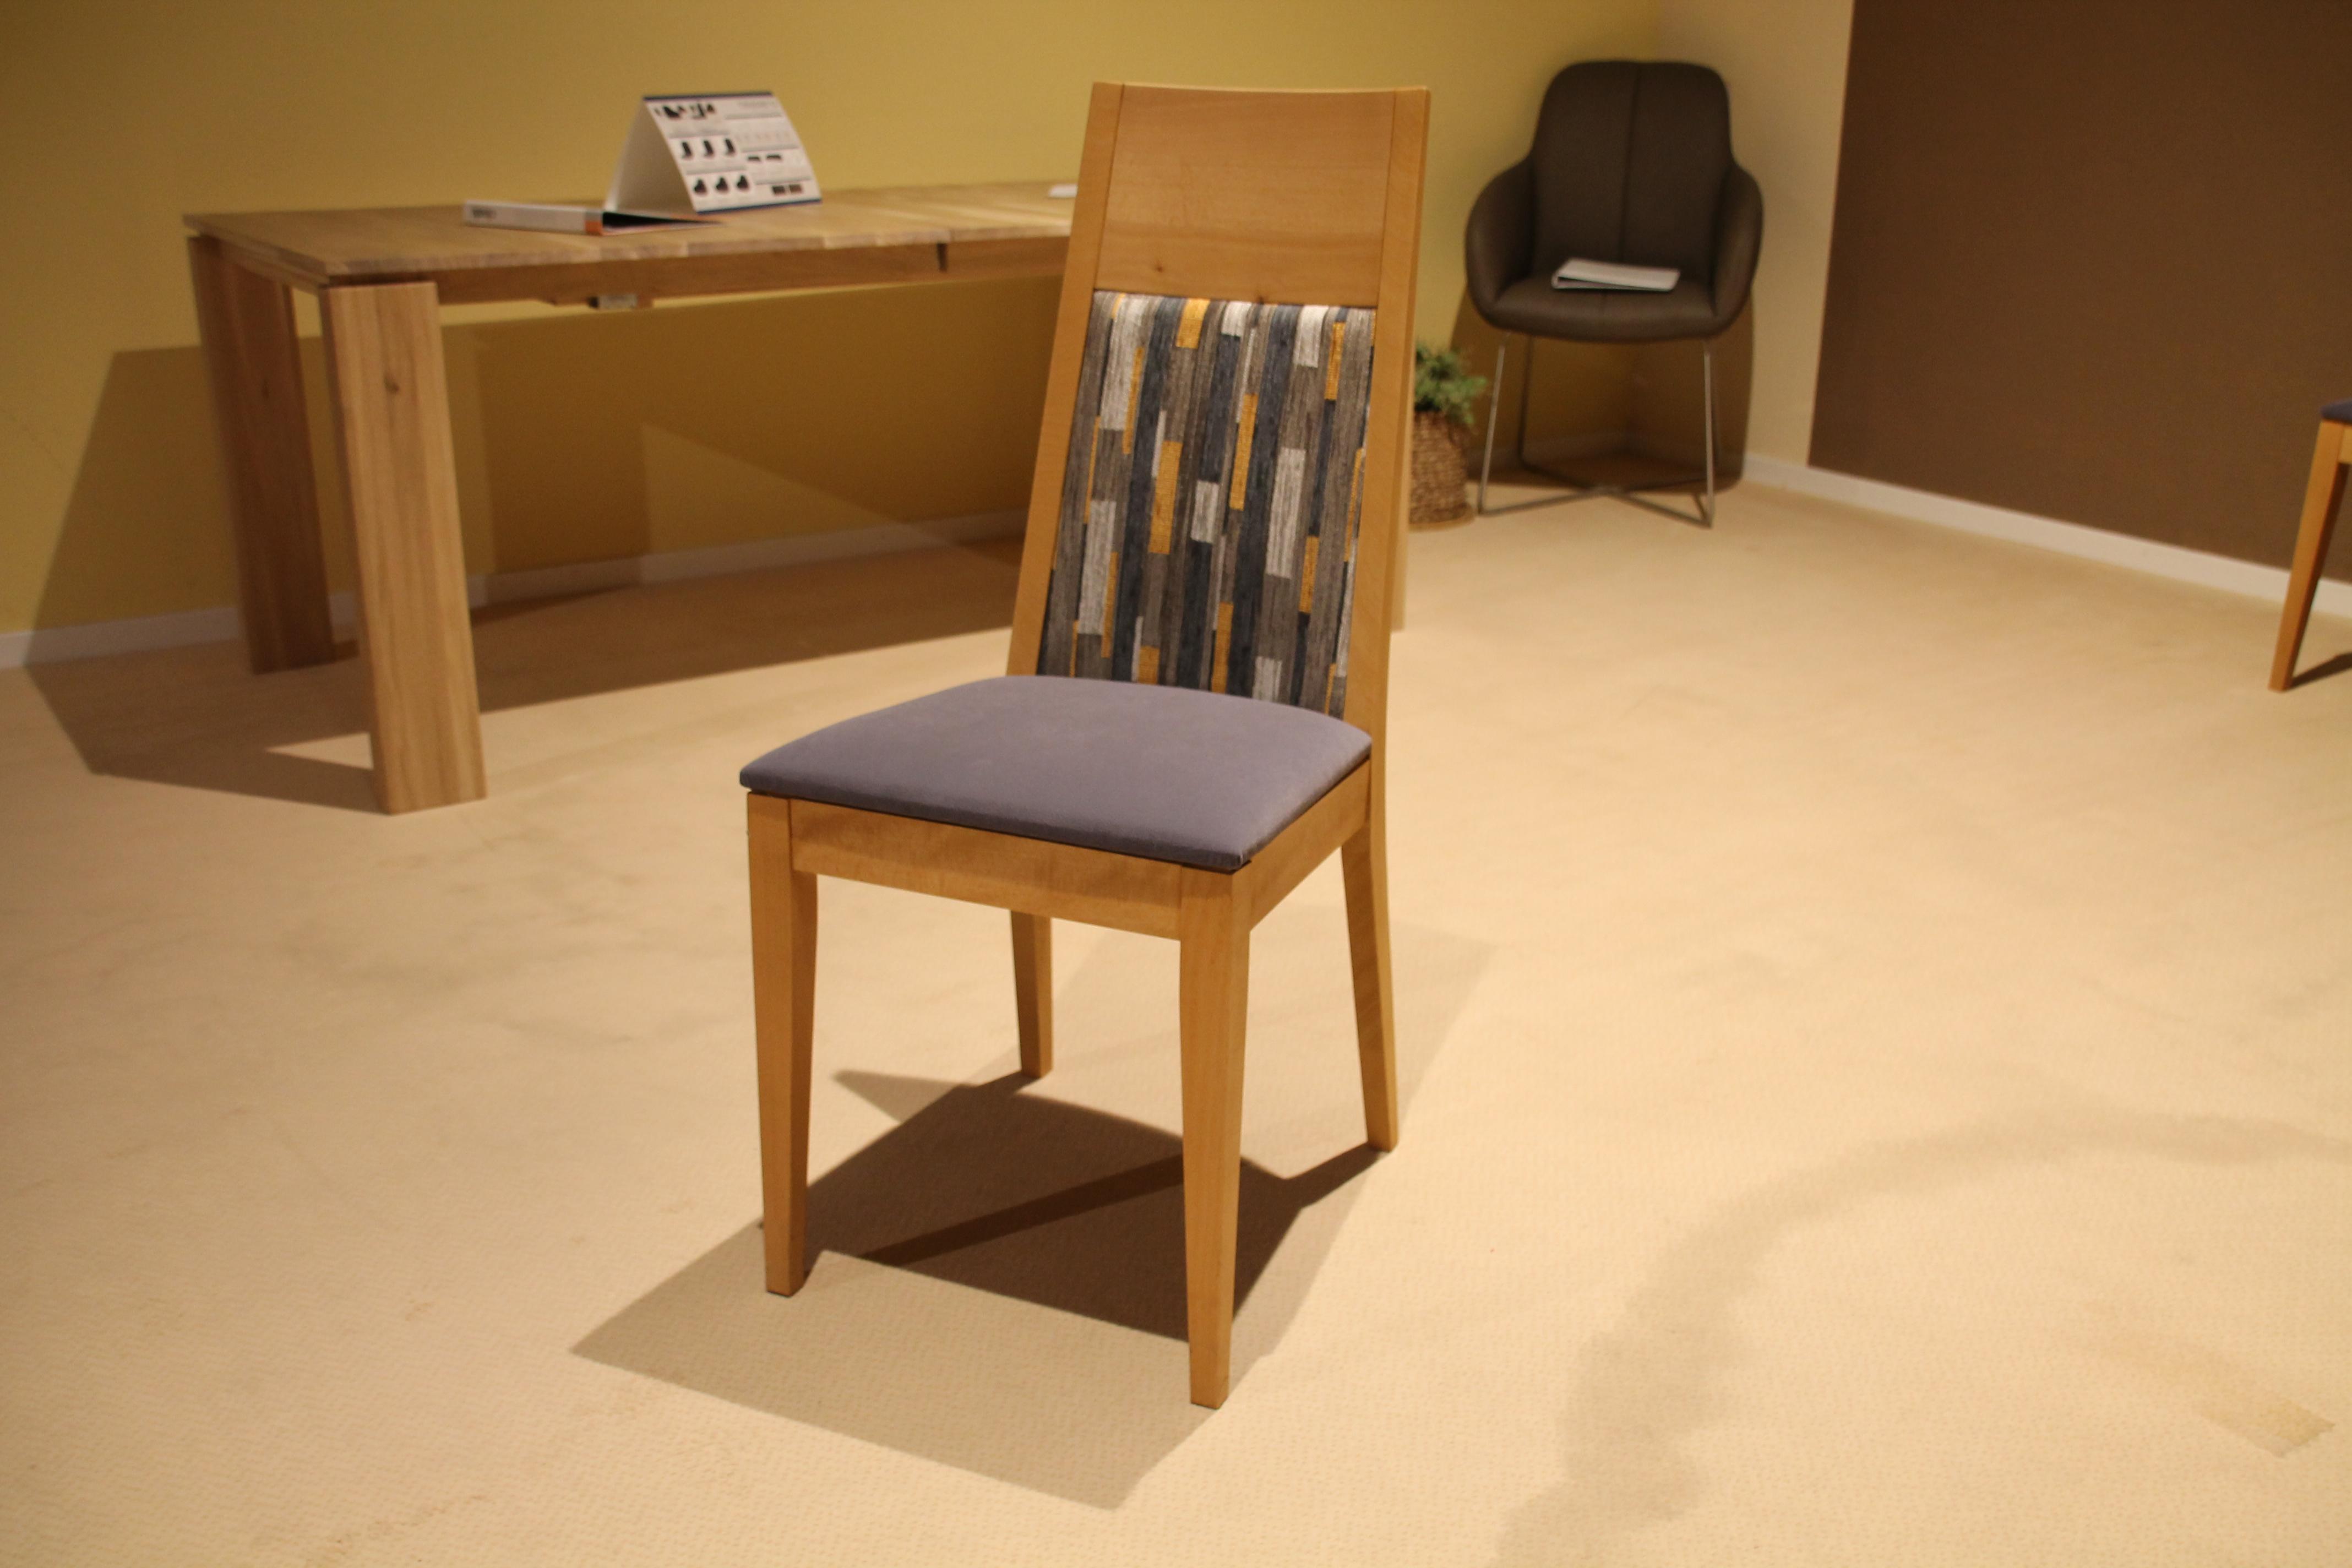 S18 - Stuhl 4-Fuß ohne Armlehne